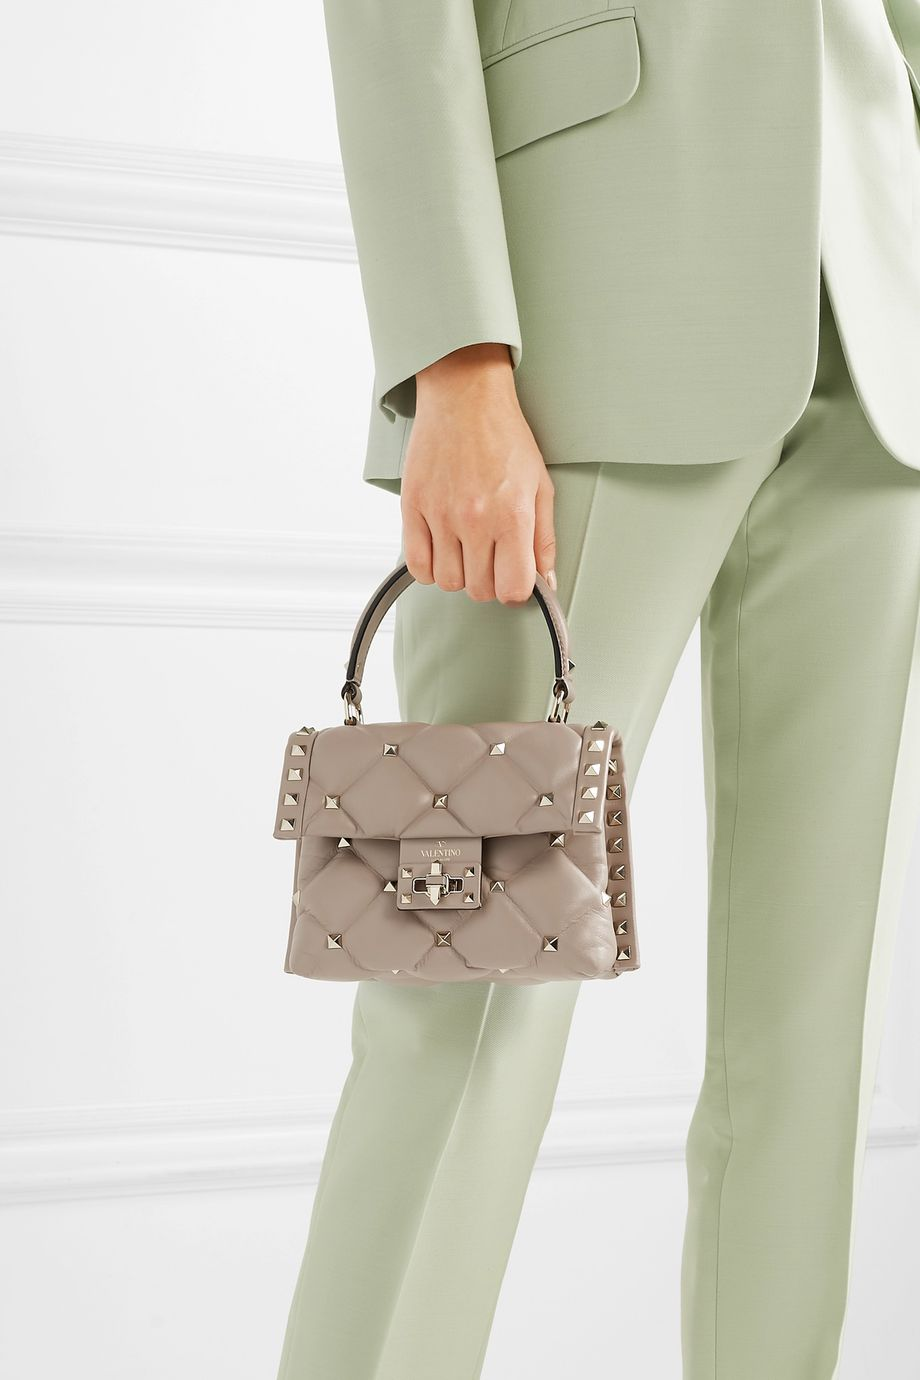 Valentino Valentino Garavani Candystud mini quilted leather shoulder bag